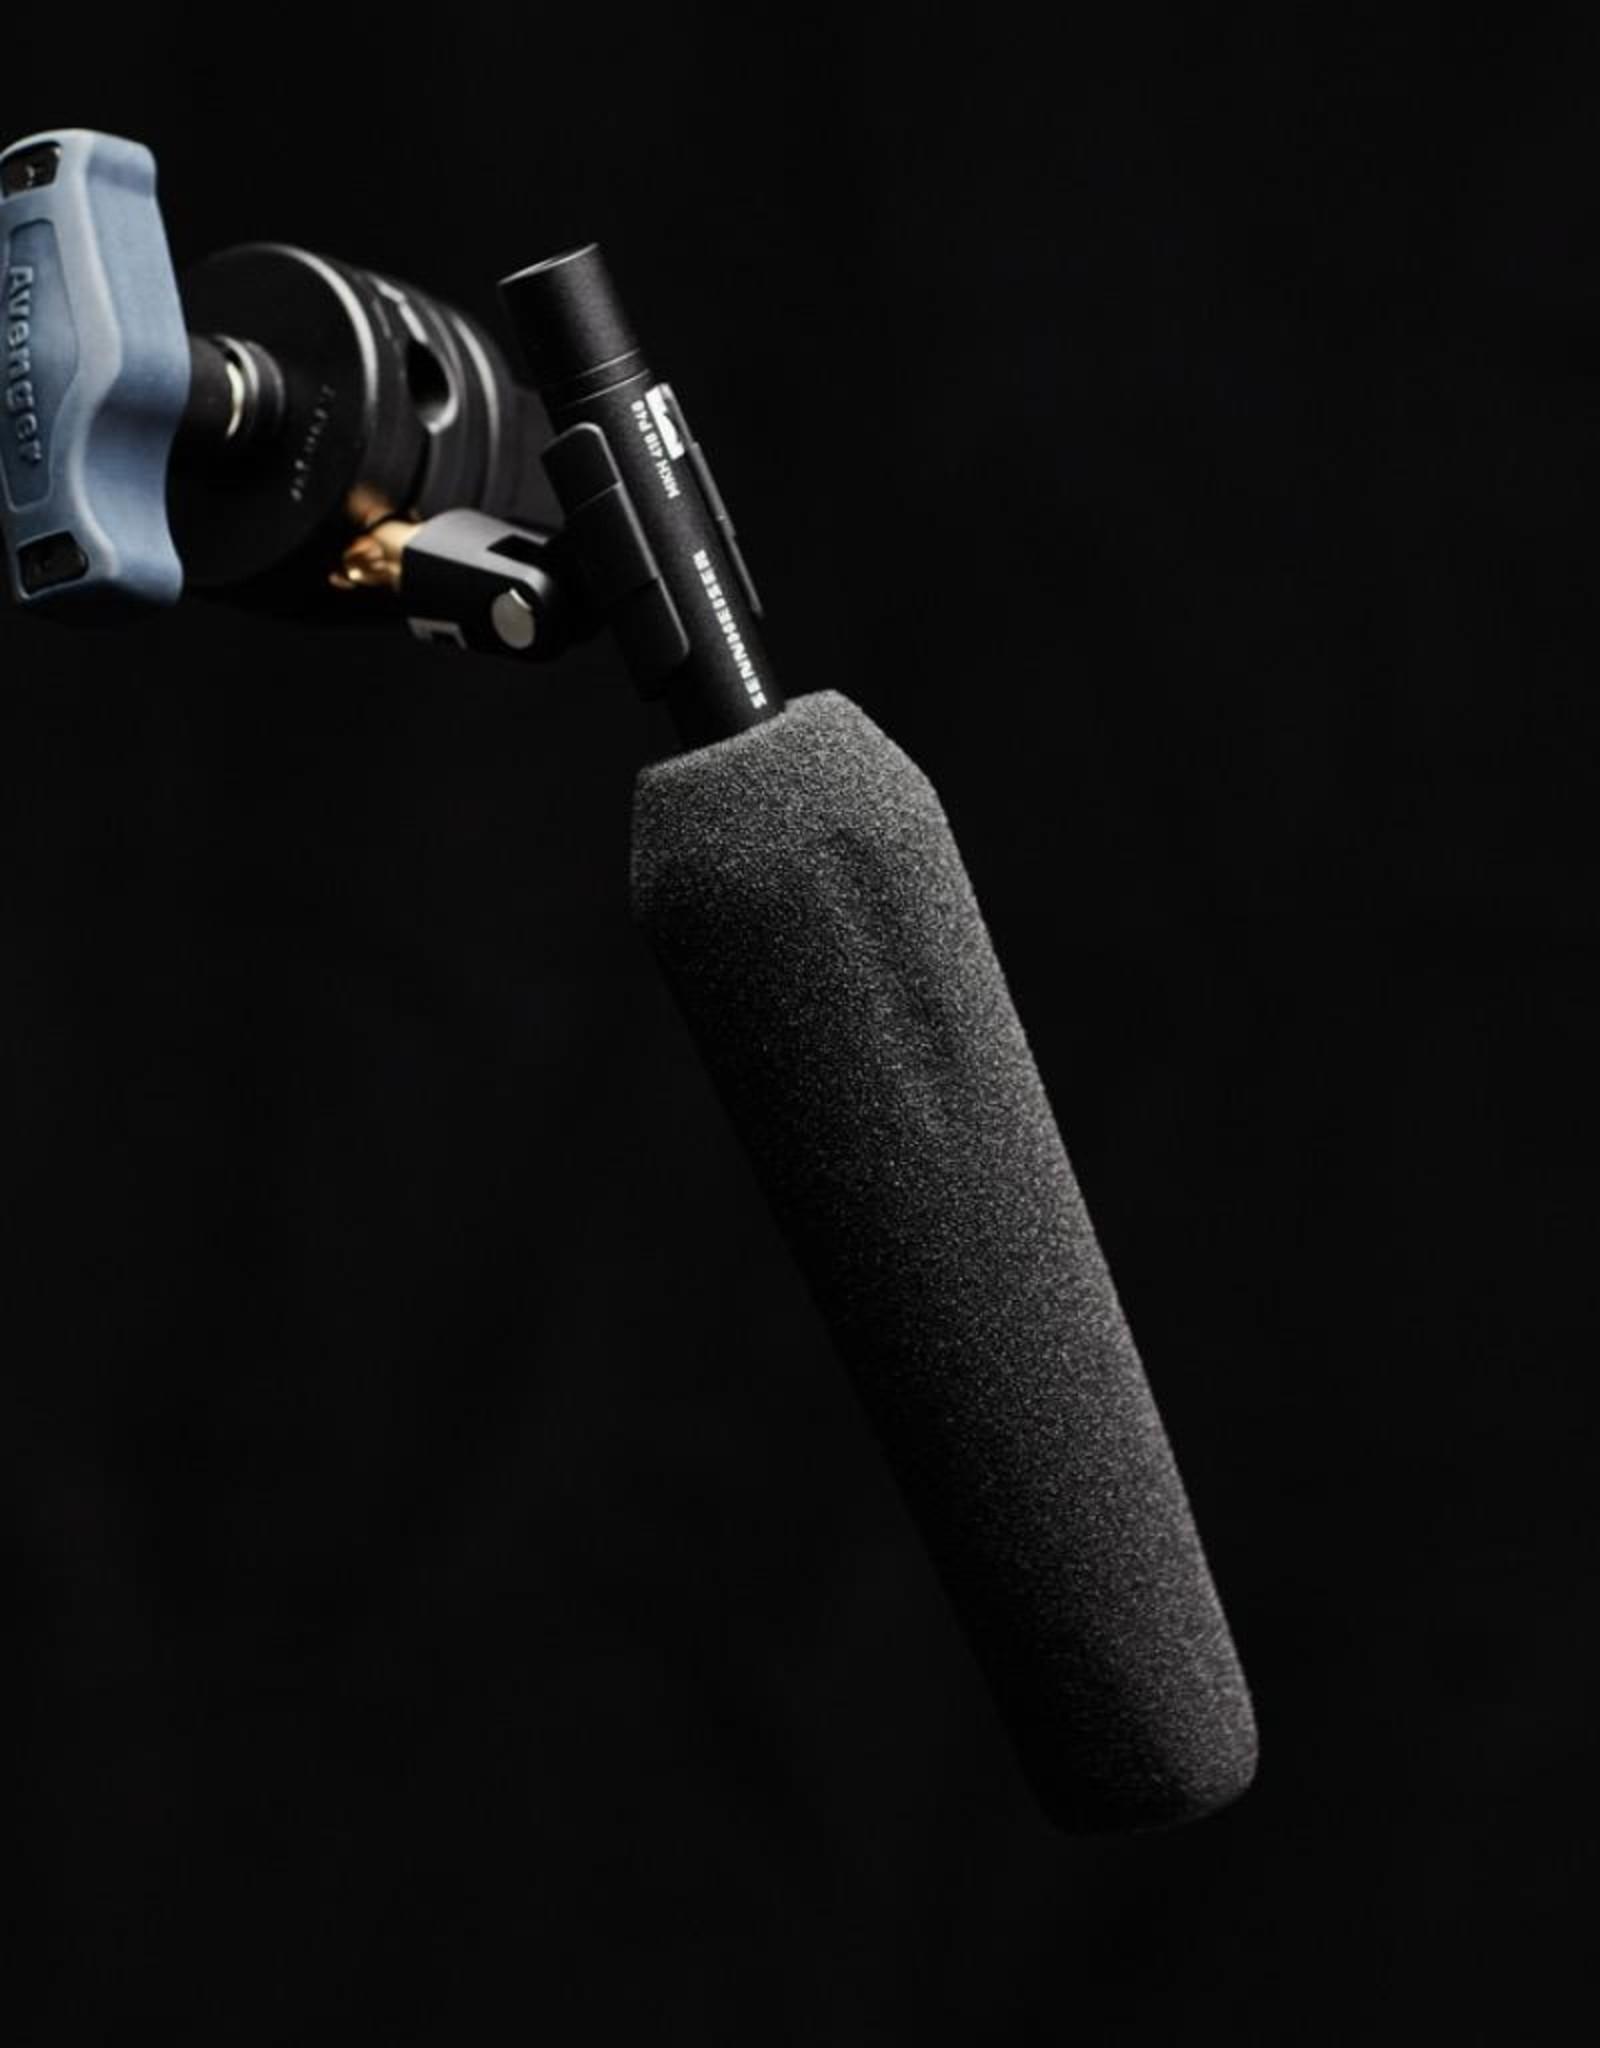 Sennheiser Sennheiser MKH 416-P48U3 RF microphone